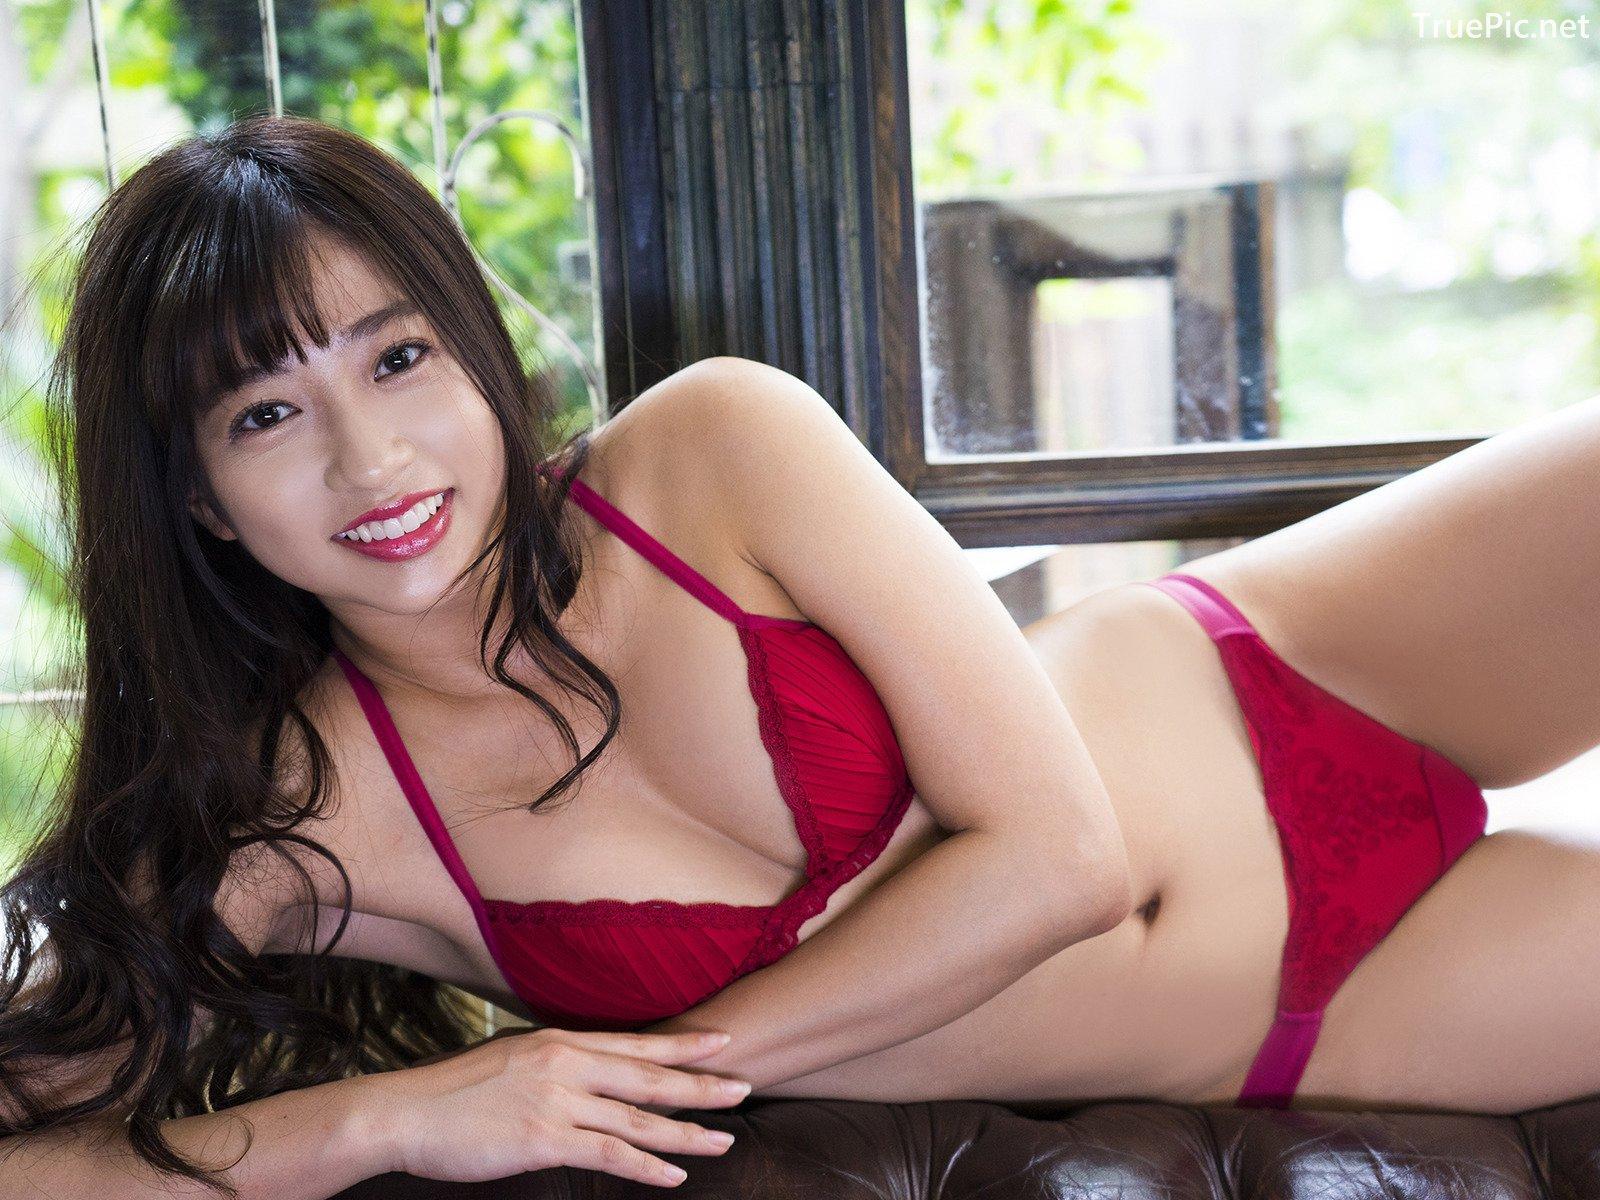 Image Japanese Gravure Model - Sayaka Ohnuki - Maiden Love Story - TruePic.net - Picture-1